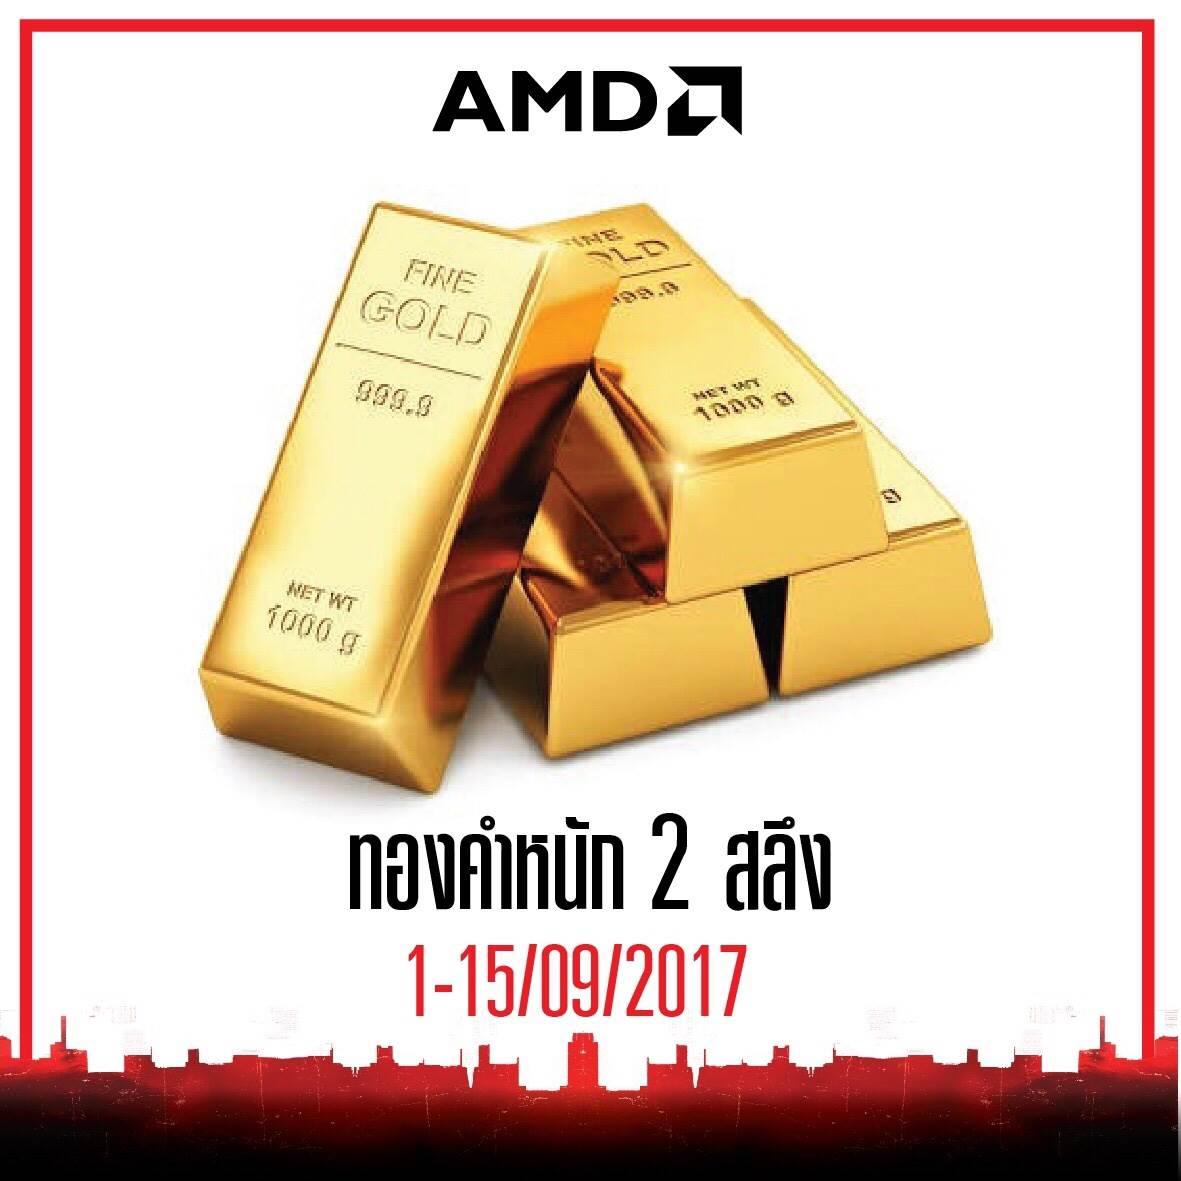 timeline 25600716 194107 AMD แจกหนัก!!! ลุ้นมันส์ กัน ยาว ยาว!!